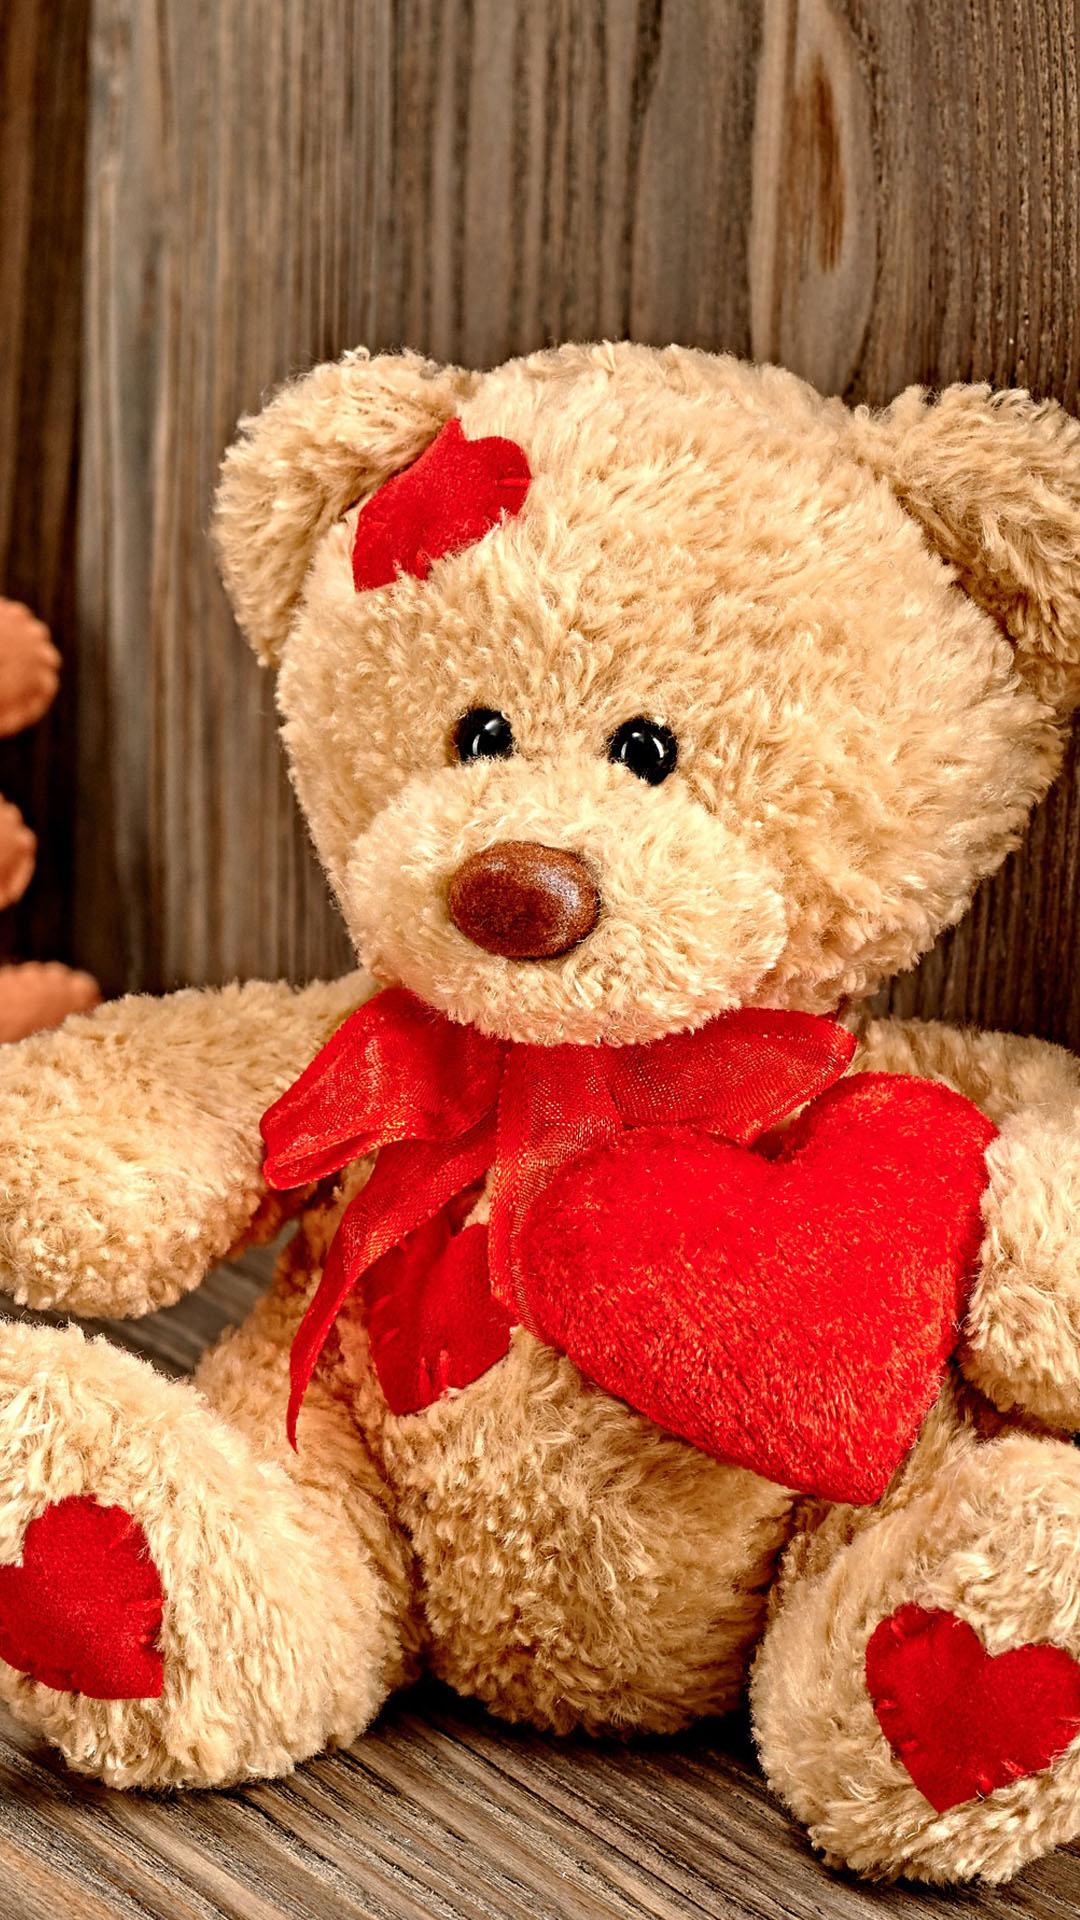 Teddy Bear Love Wallpaper Wallpapersafari